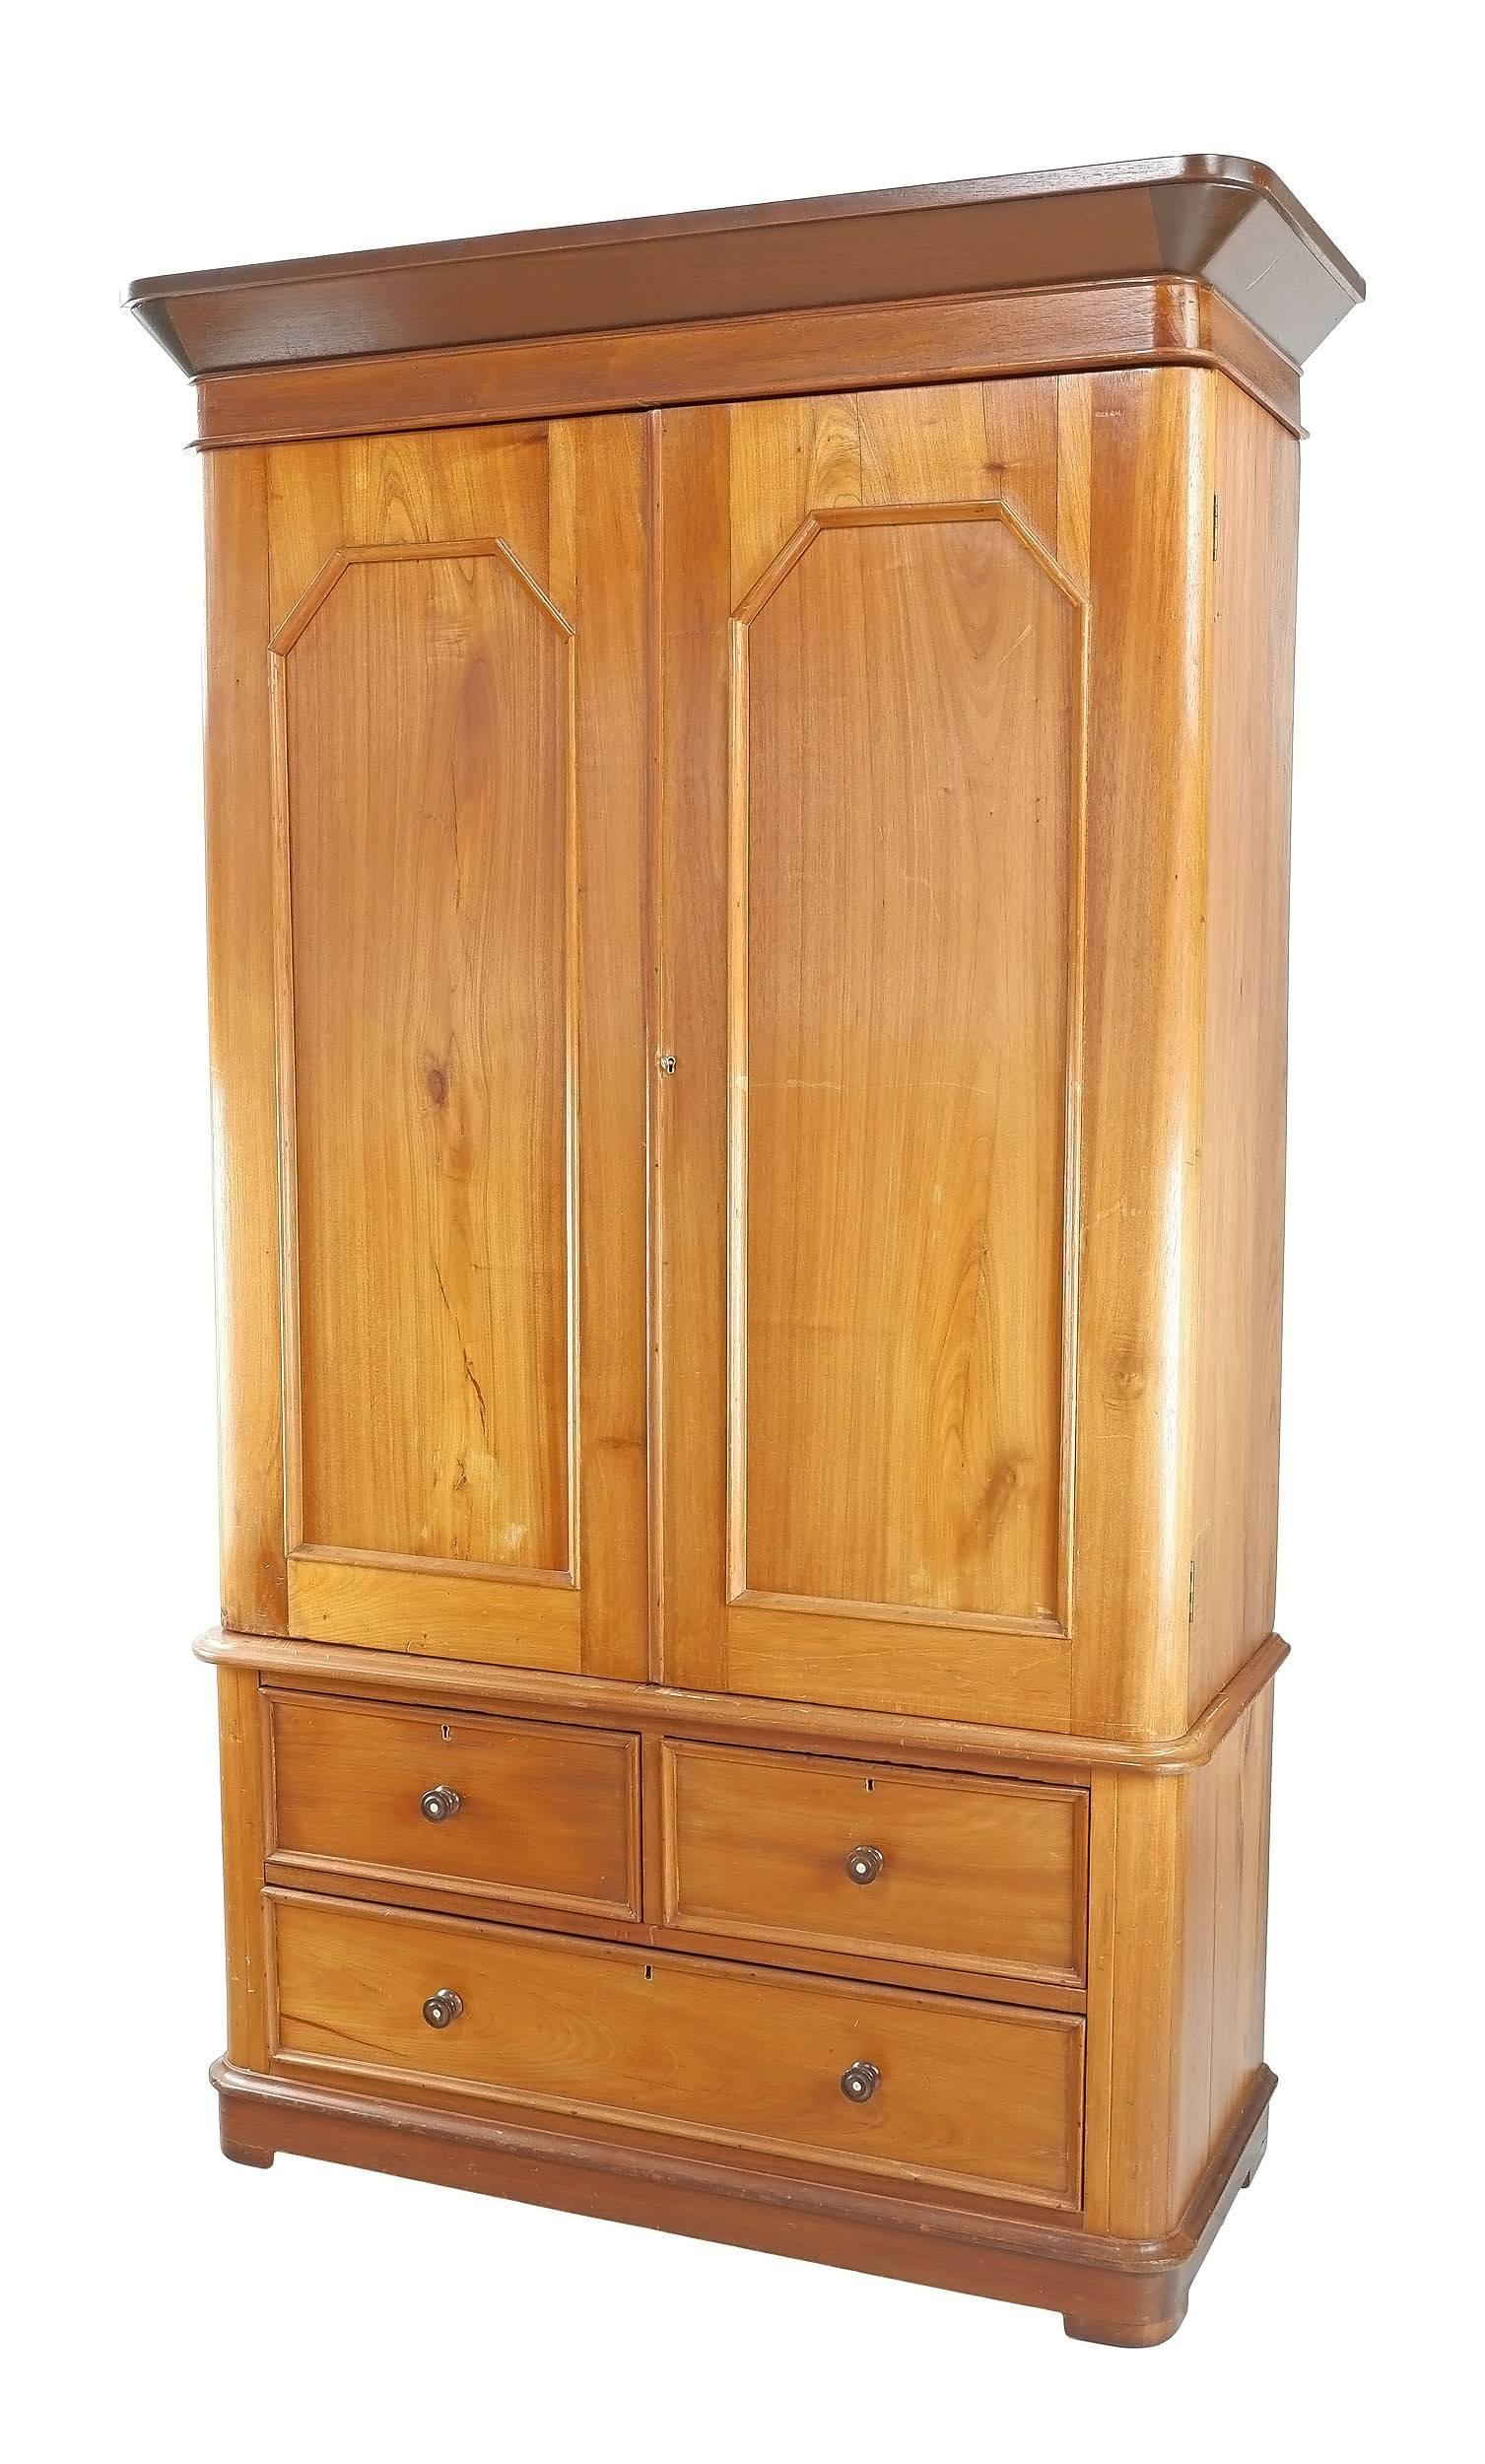 'Antique Australian Cedar Two Door Wardrobe with Three Drawers Below, Late 19th Century'